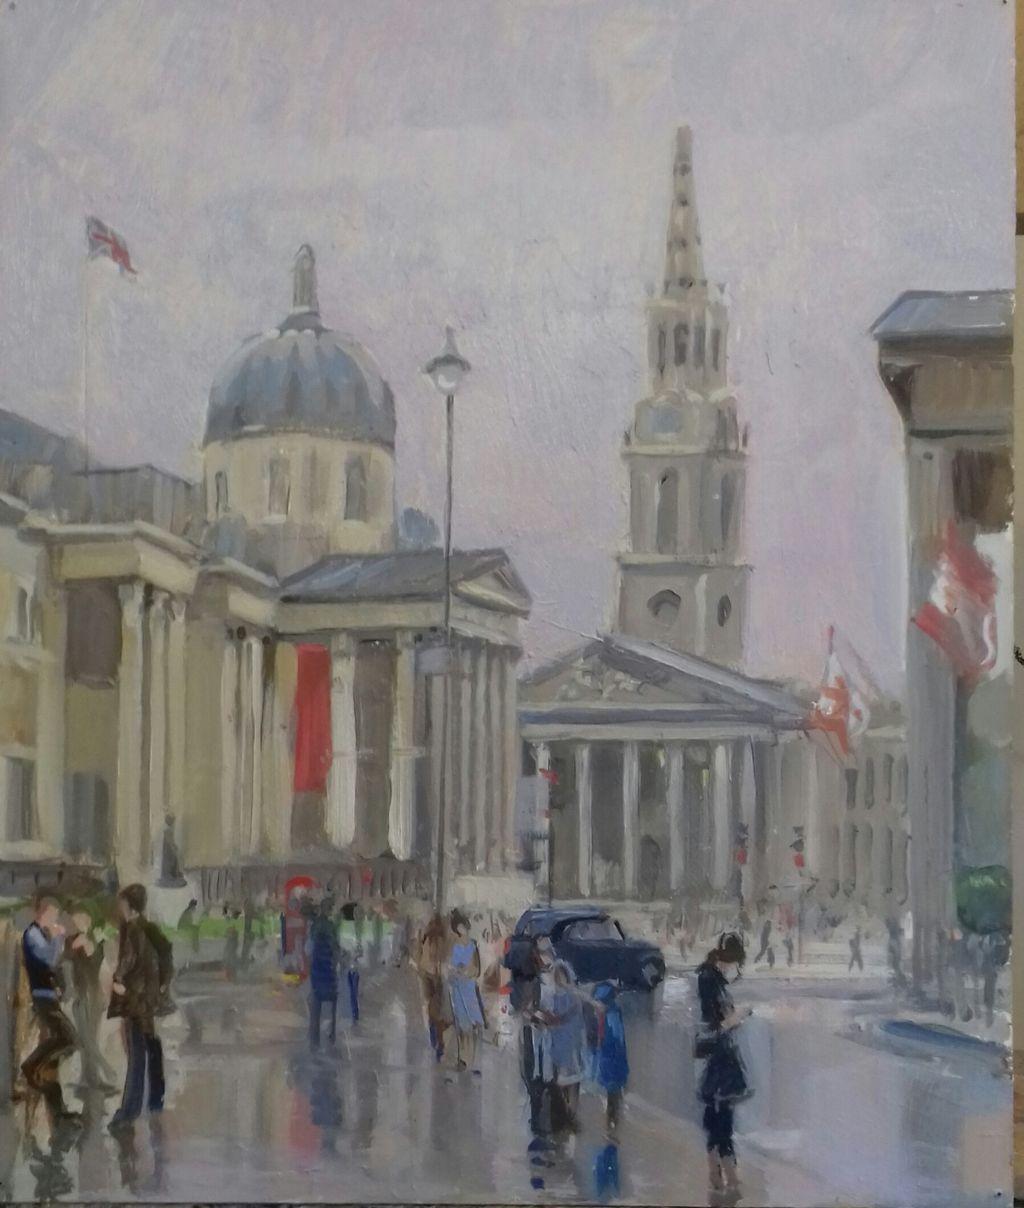 The Red Banner, Trafalgar Square.